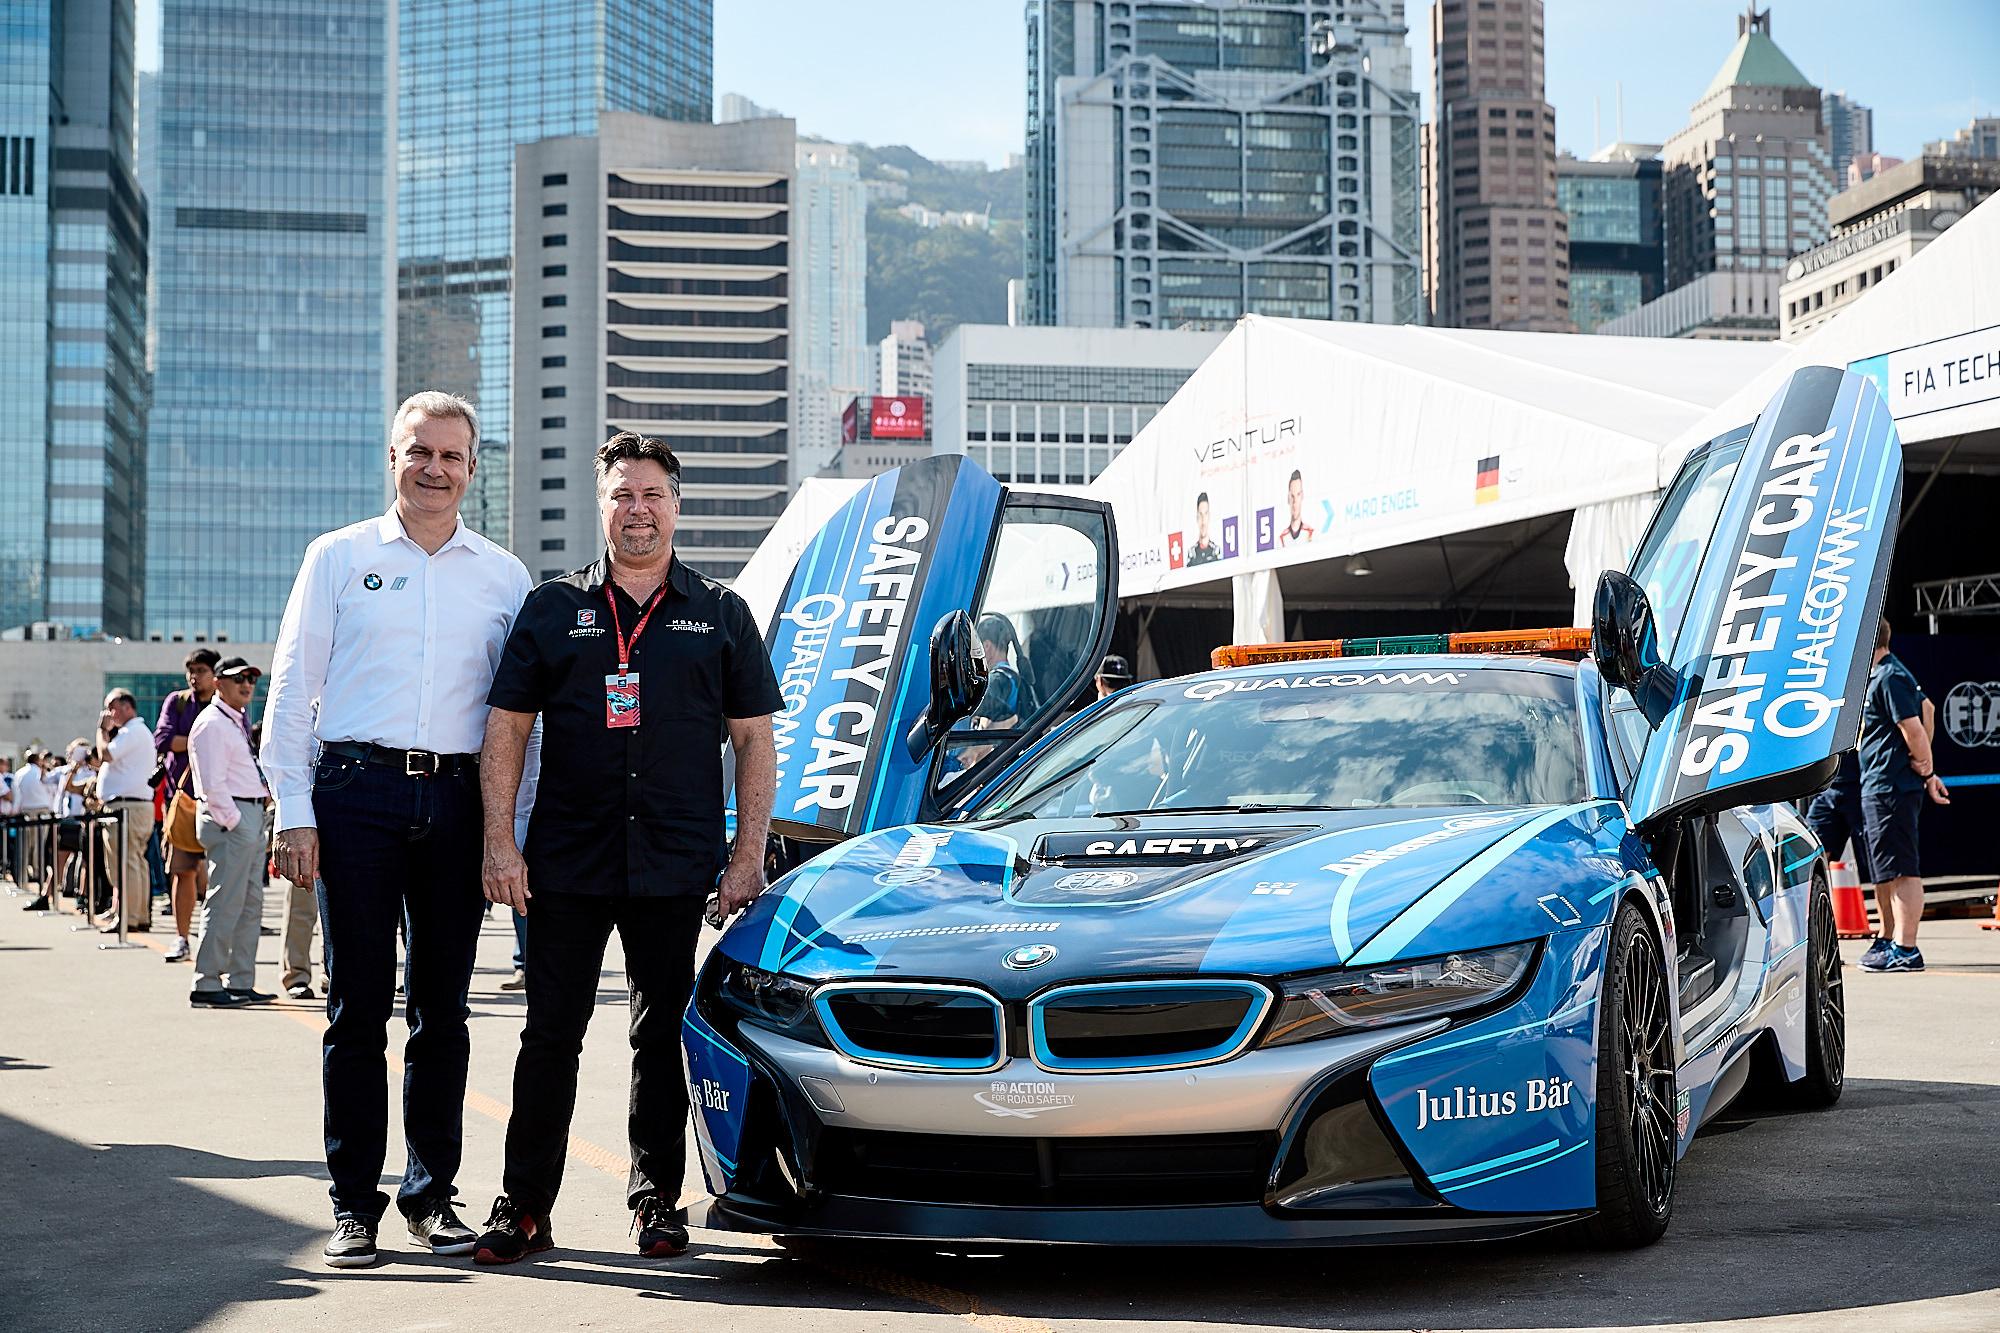 Jens Marquardt and Michael Andretti